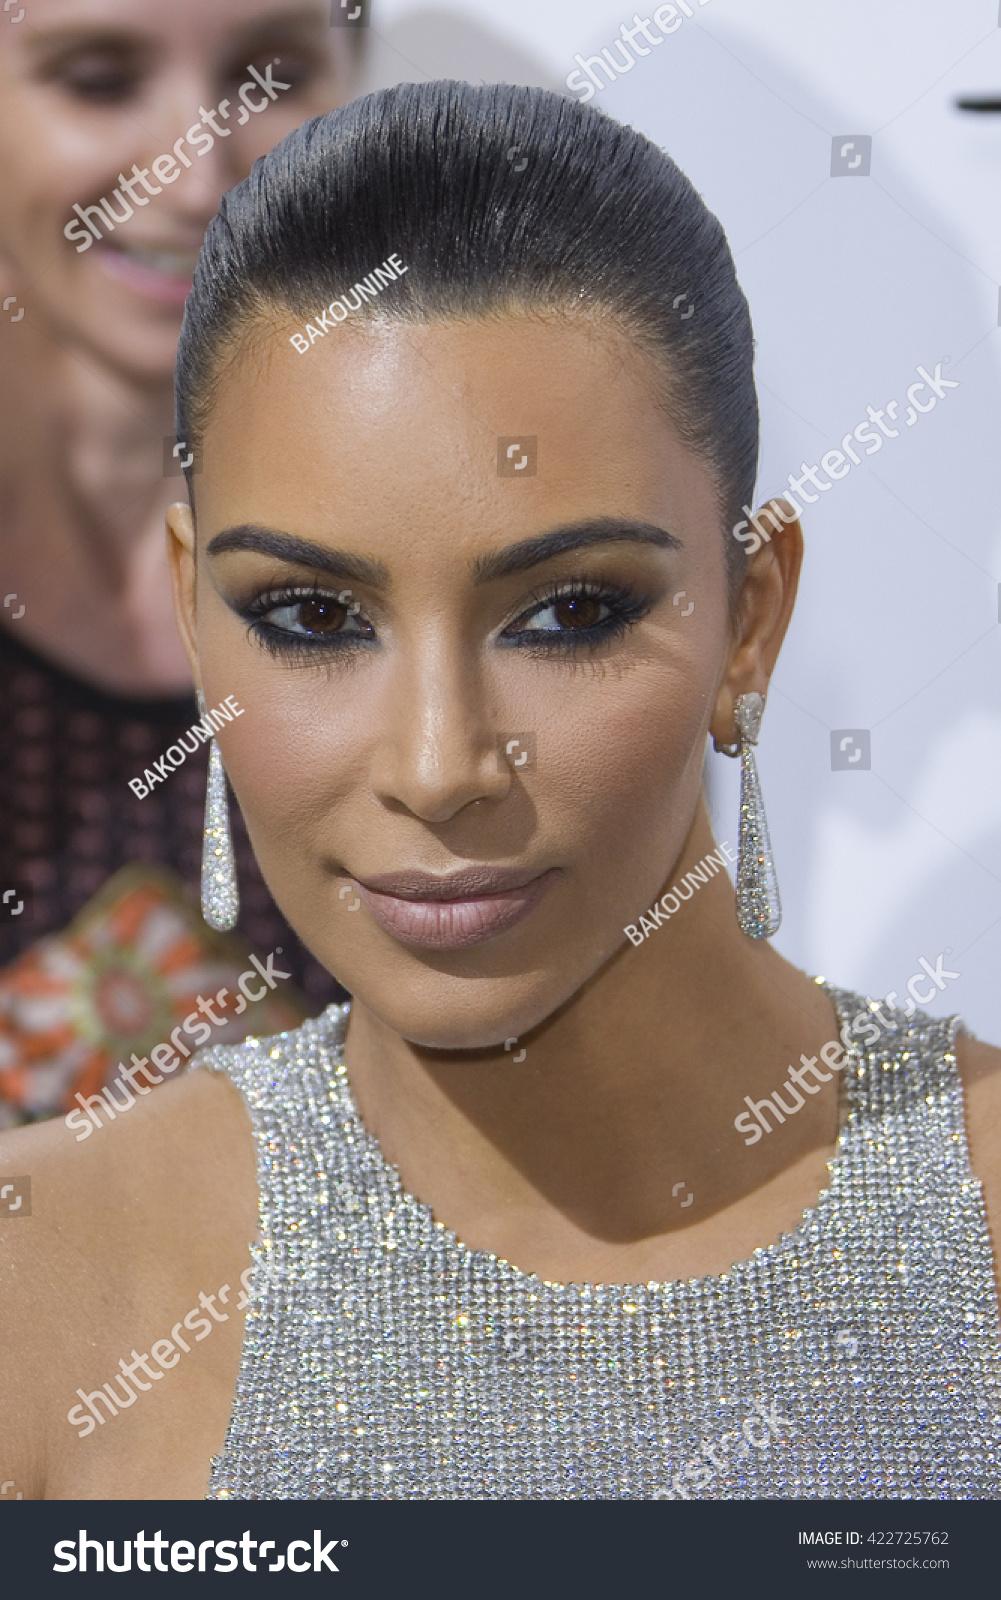 Shutterstock Editor 是一款在线图片和照片编辑器。 Kim Kardashian